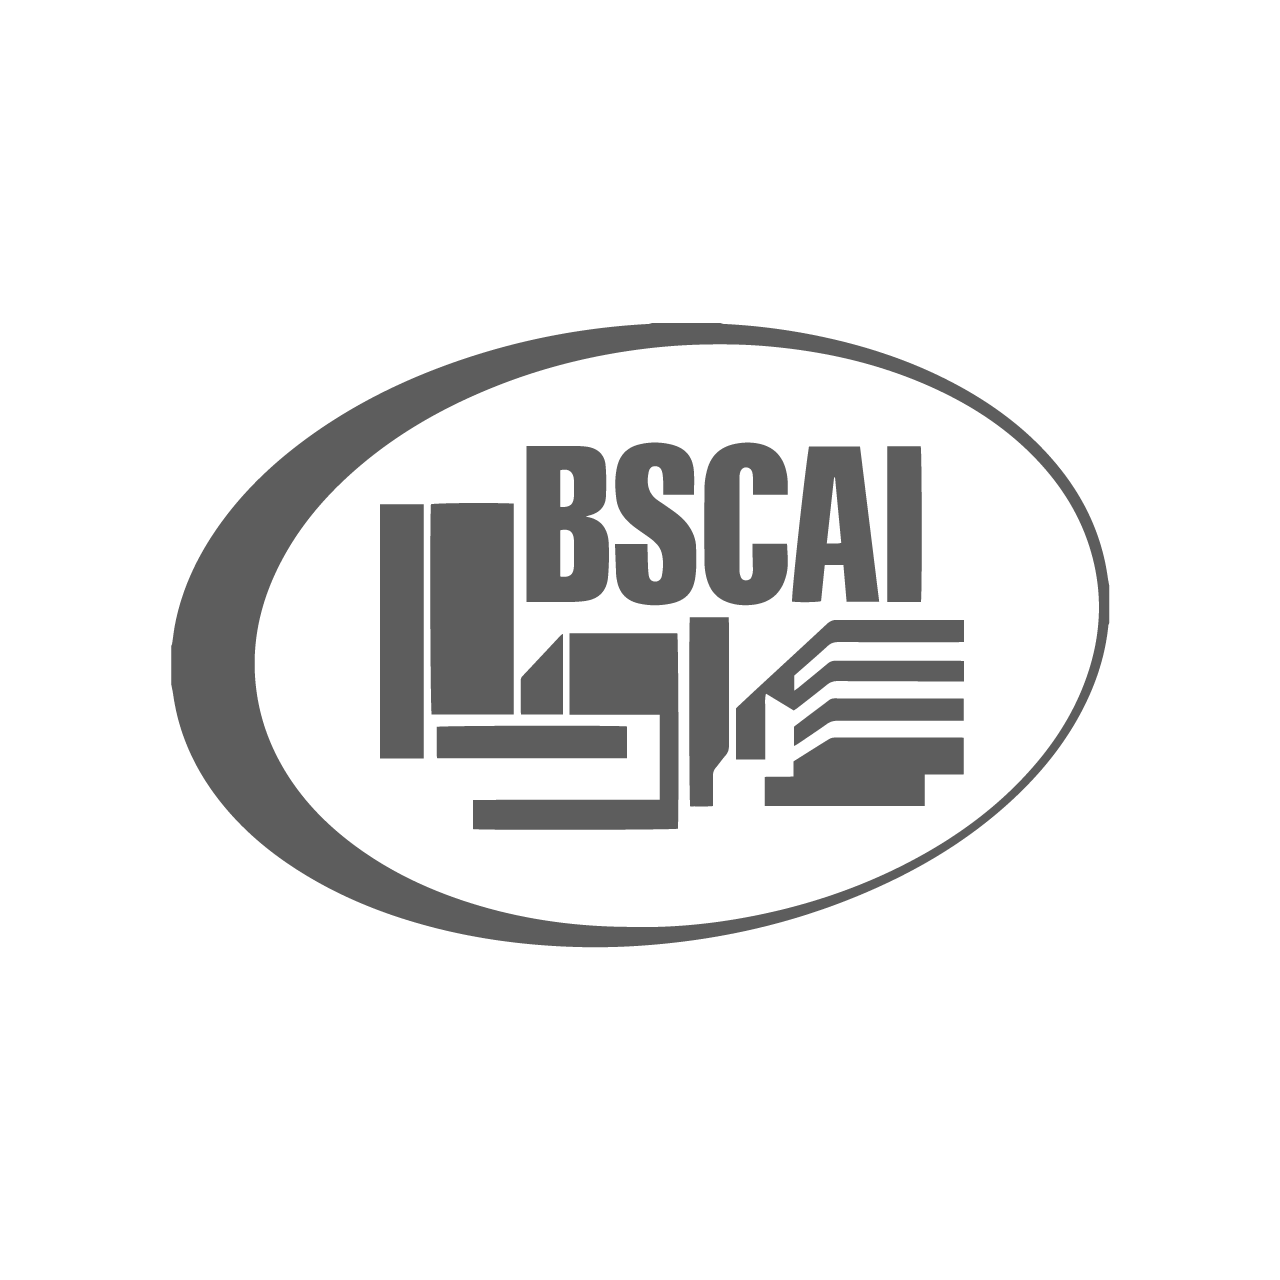 BSCAI-LOGO-GREY